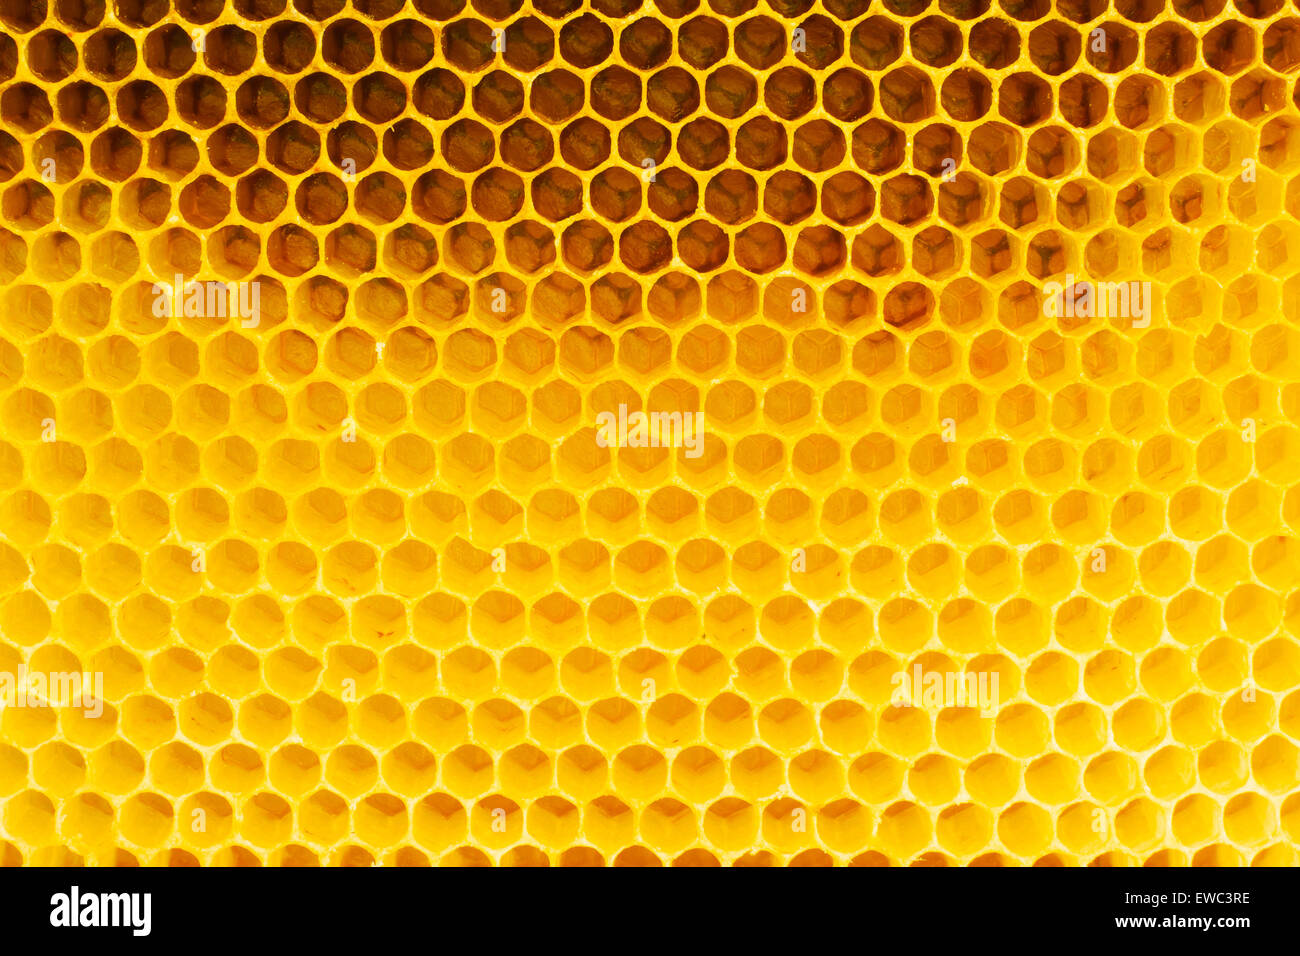 Honeycomb in beehive, closeup - Stock Image